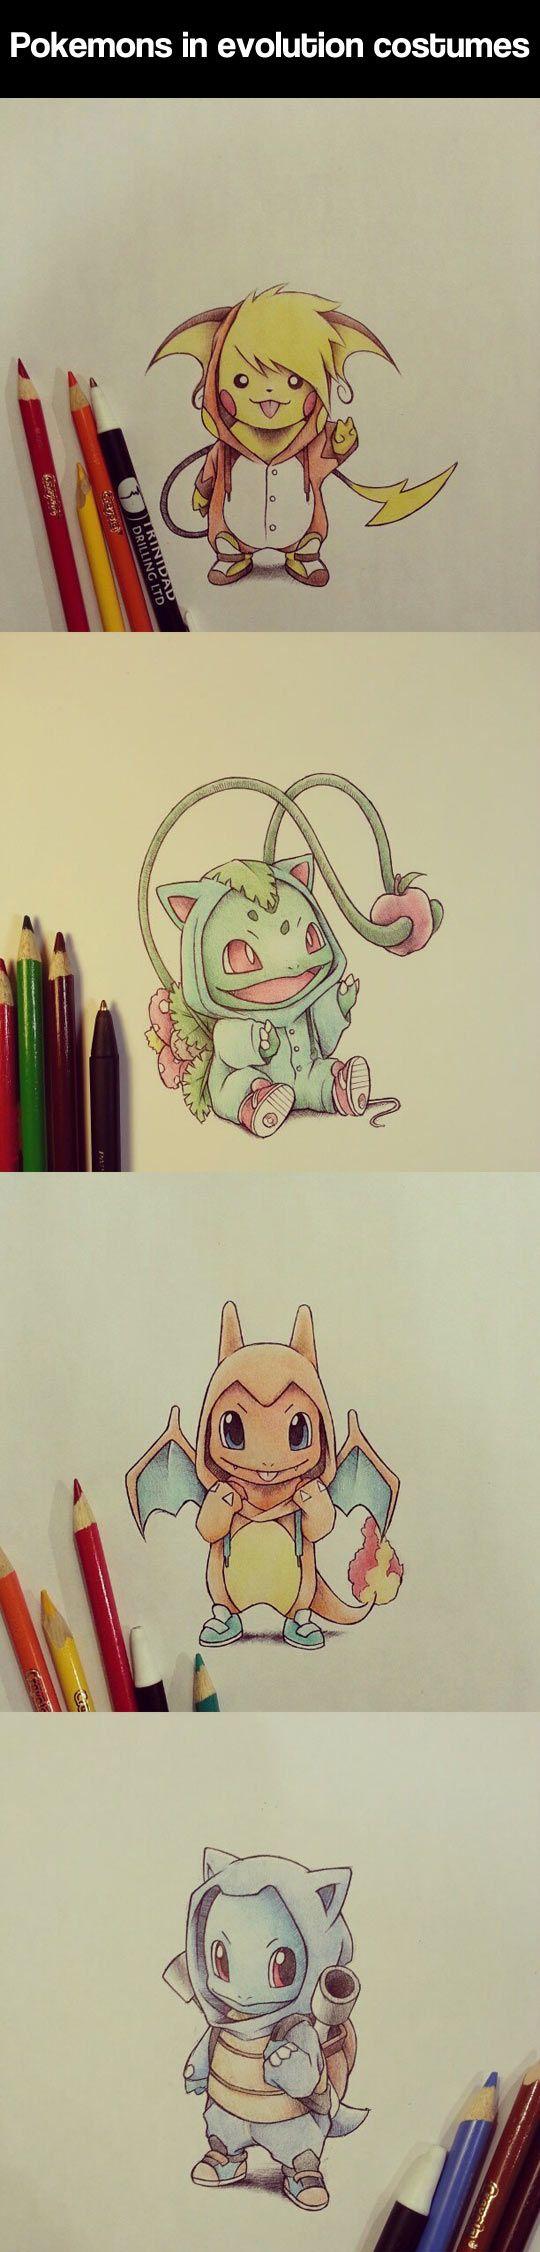 Pokemon wearing evolution costumes.